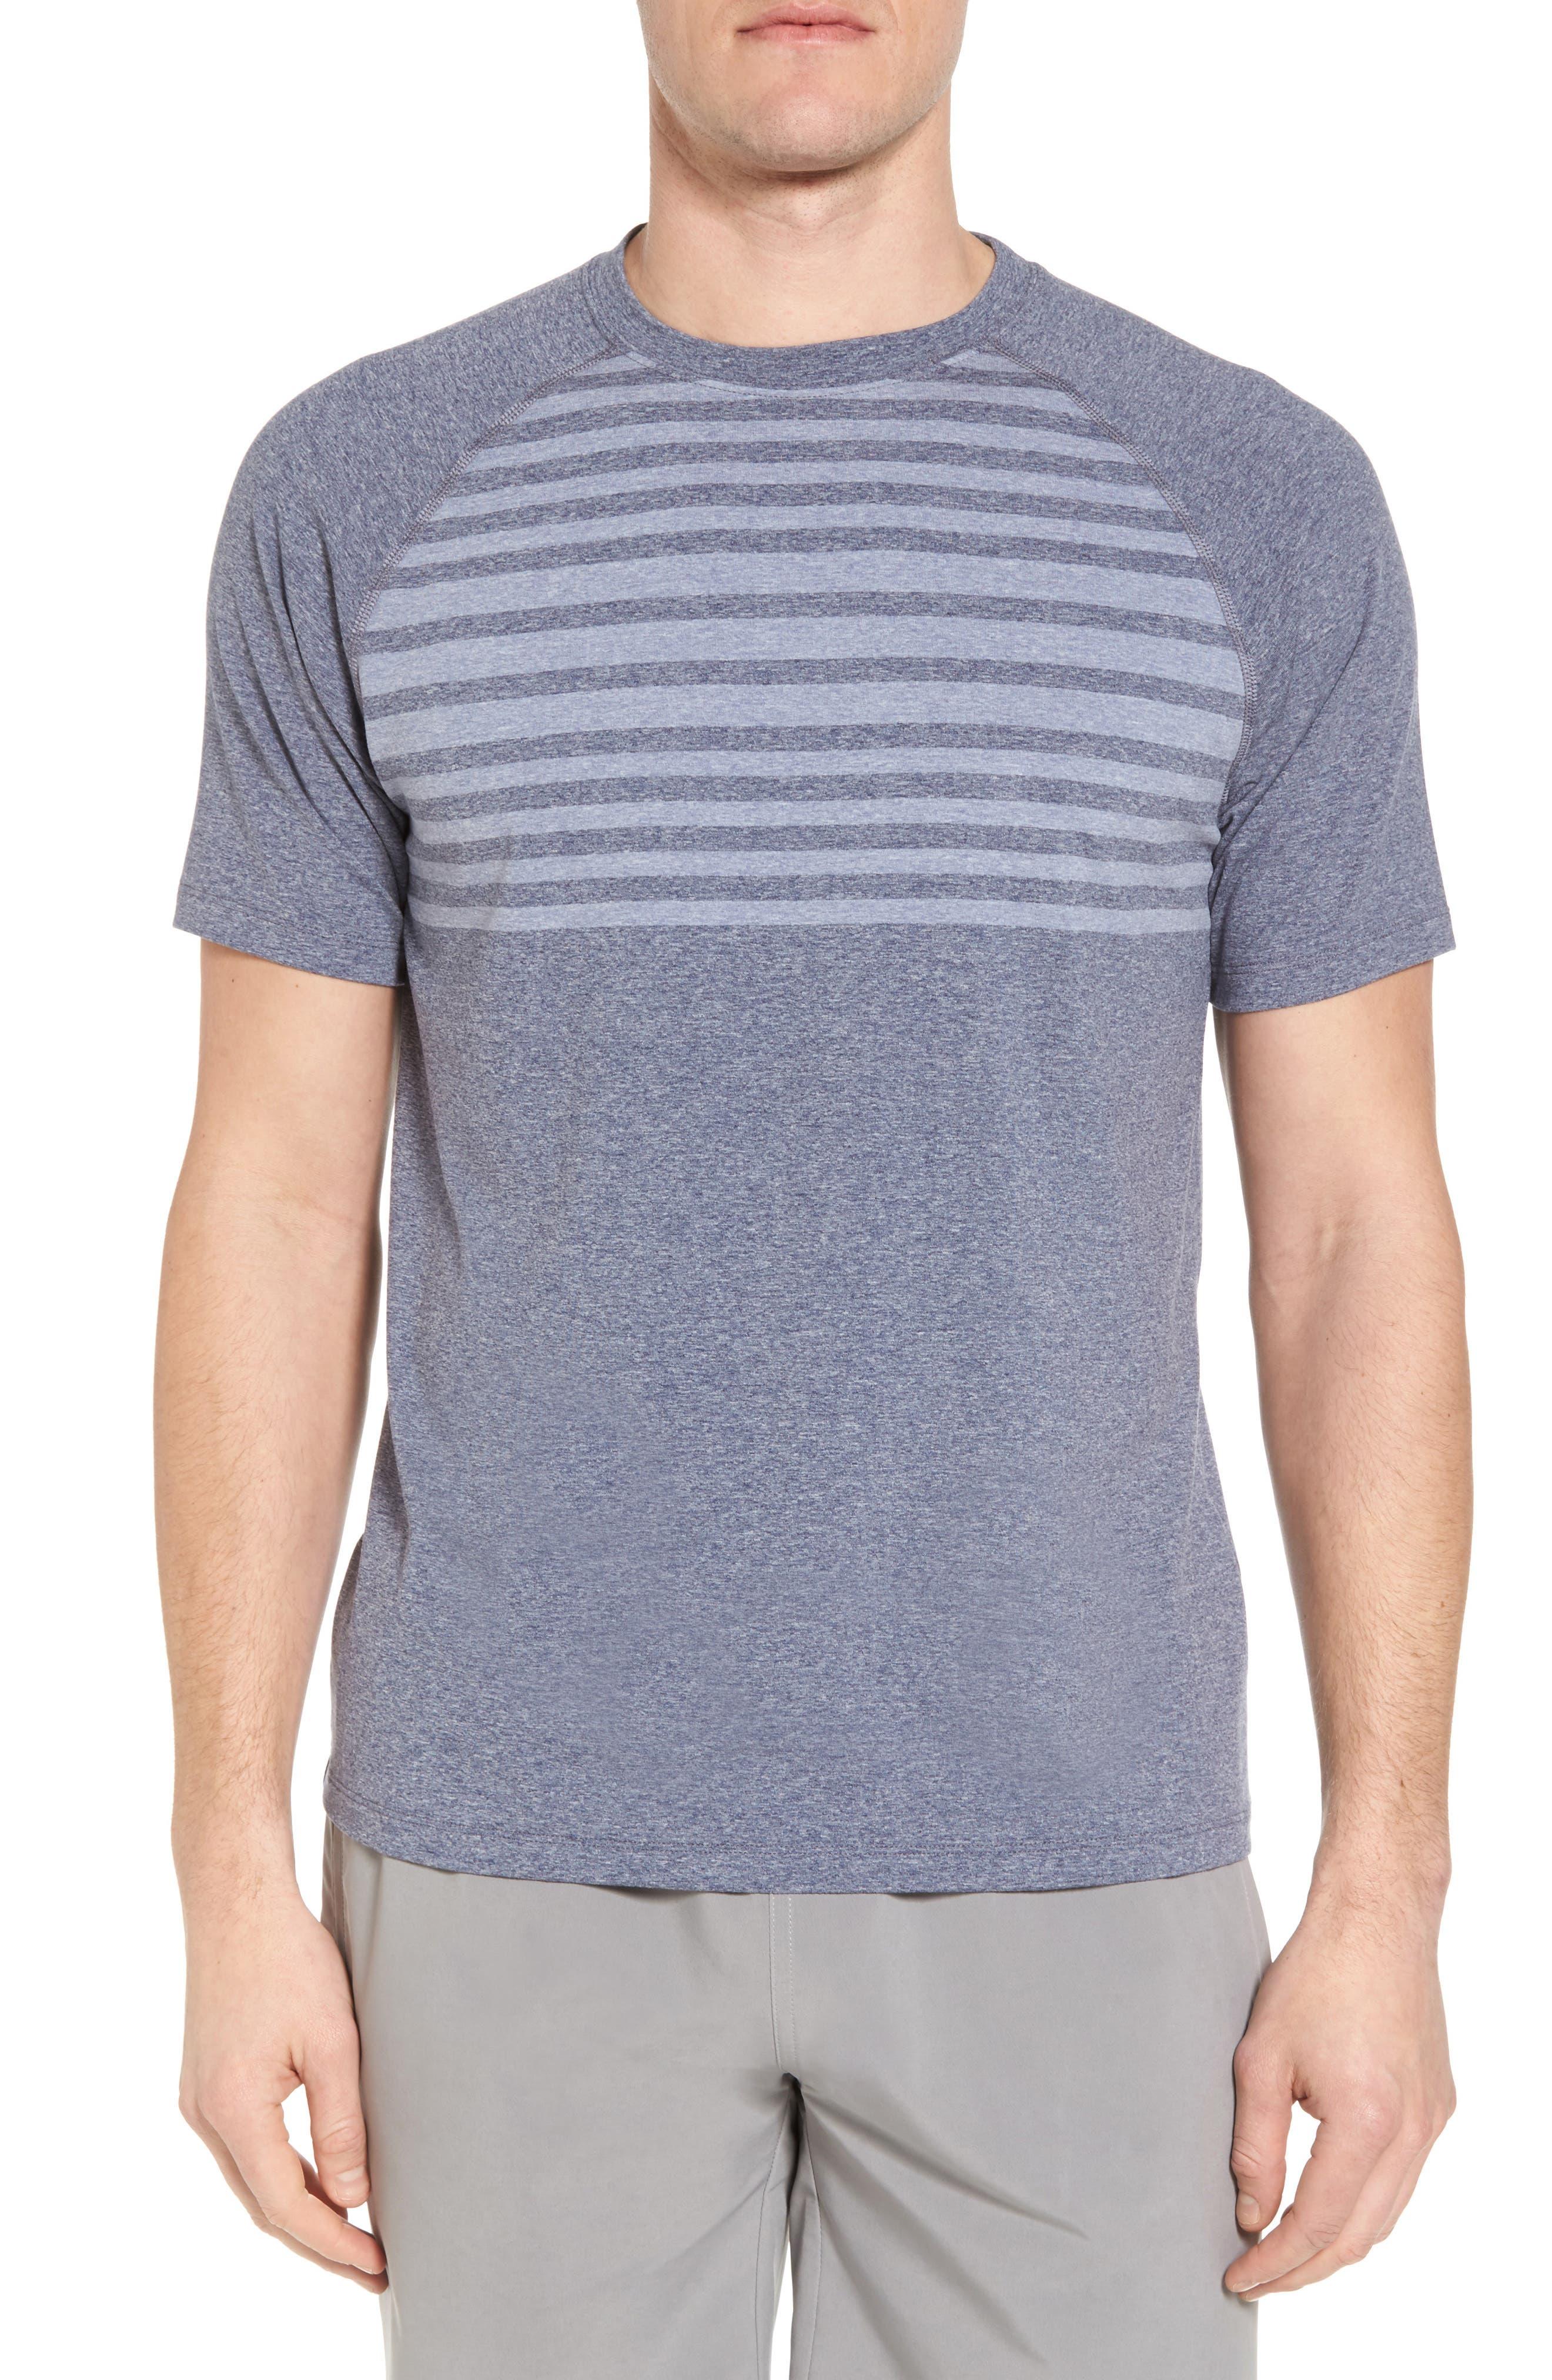 Alternate Image 1 Selected - Peter Millar Rio Stripe Technical T-Shirt